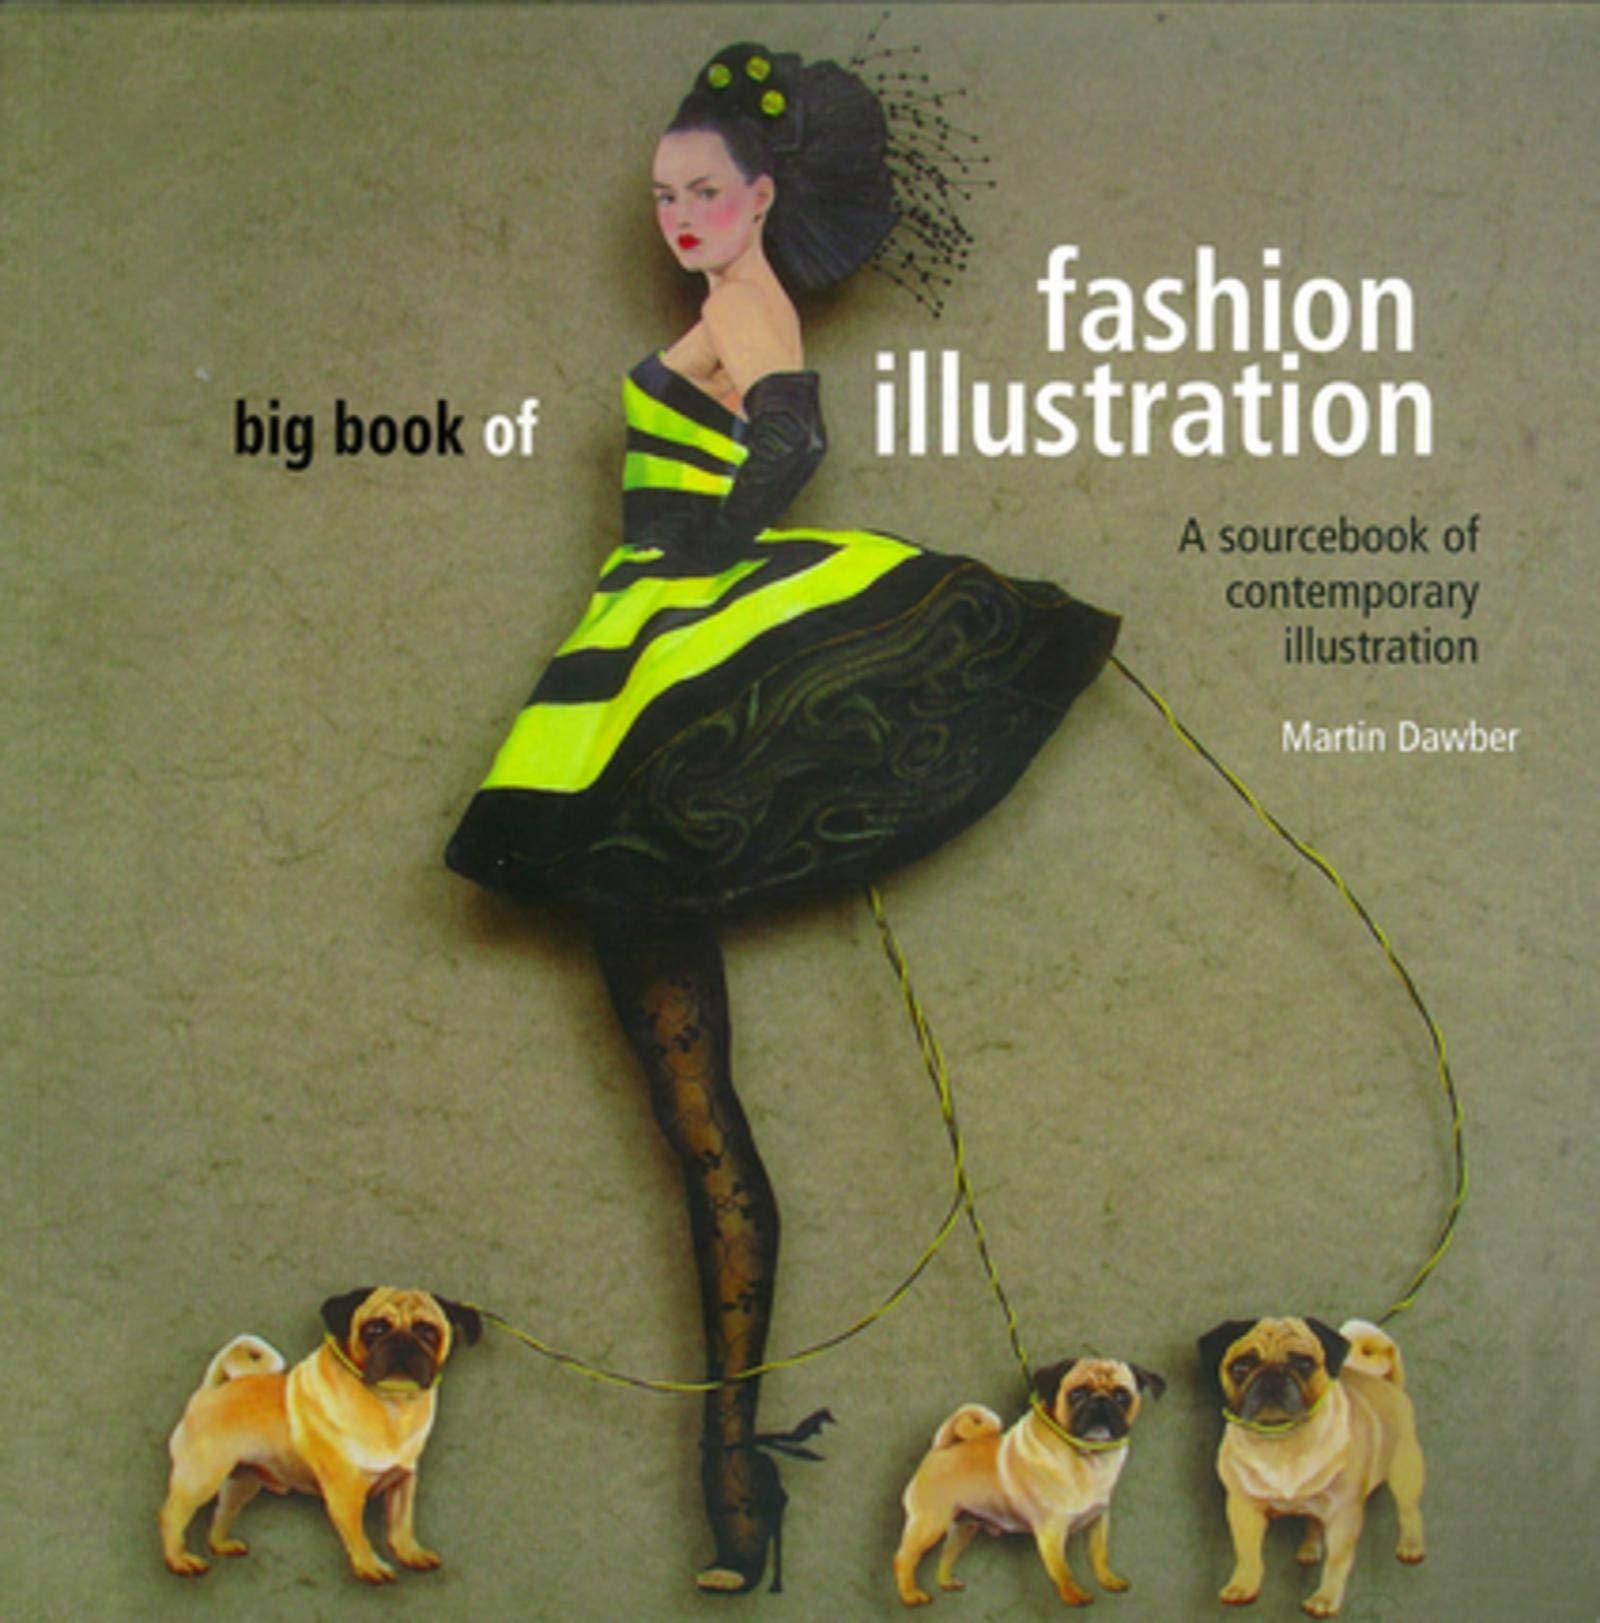 Big Book Of Fashion Illustration A Sourcebook Of Contemporary Illustration Anova Books Dawber Martin 9780713490459 Amazon Com Books